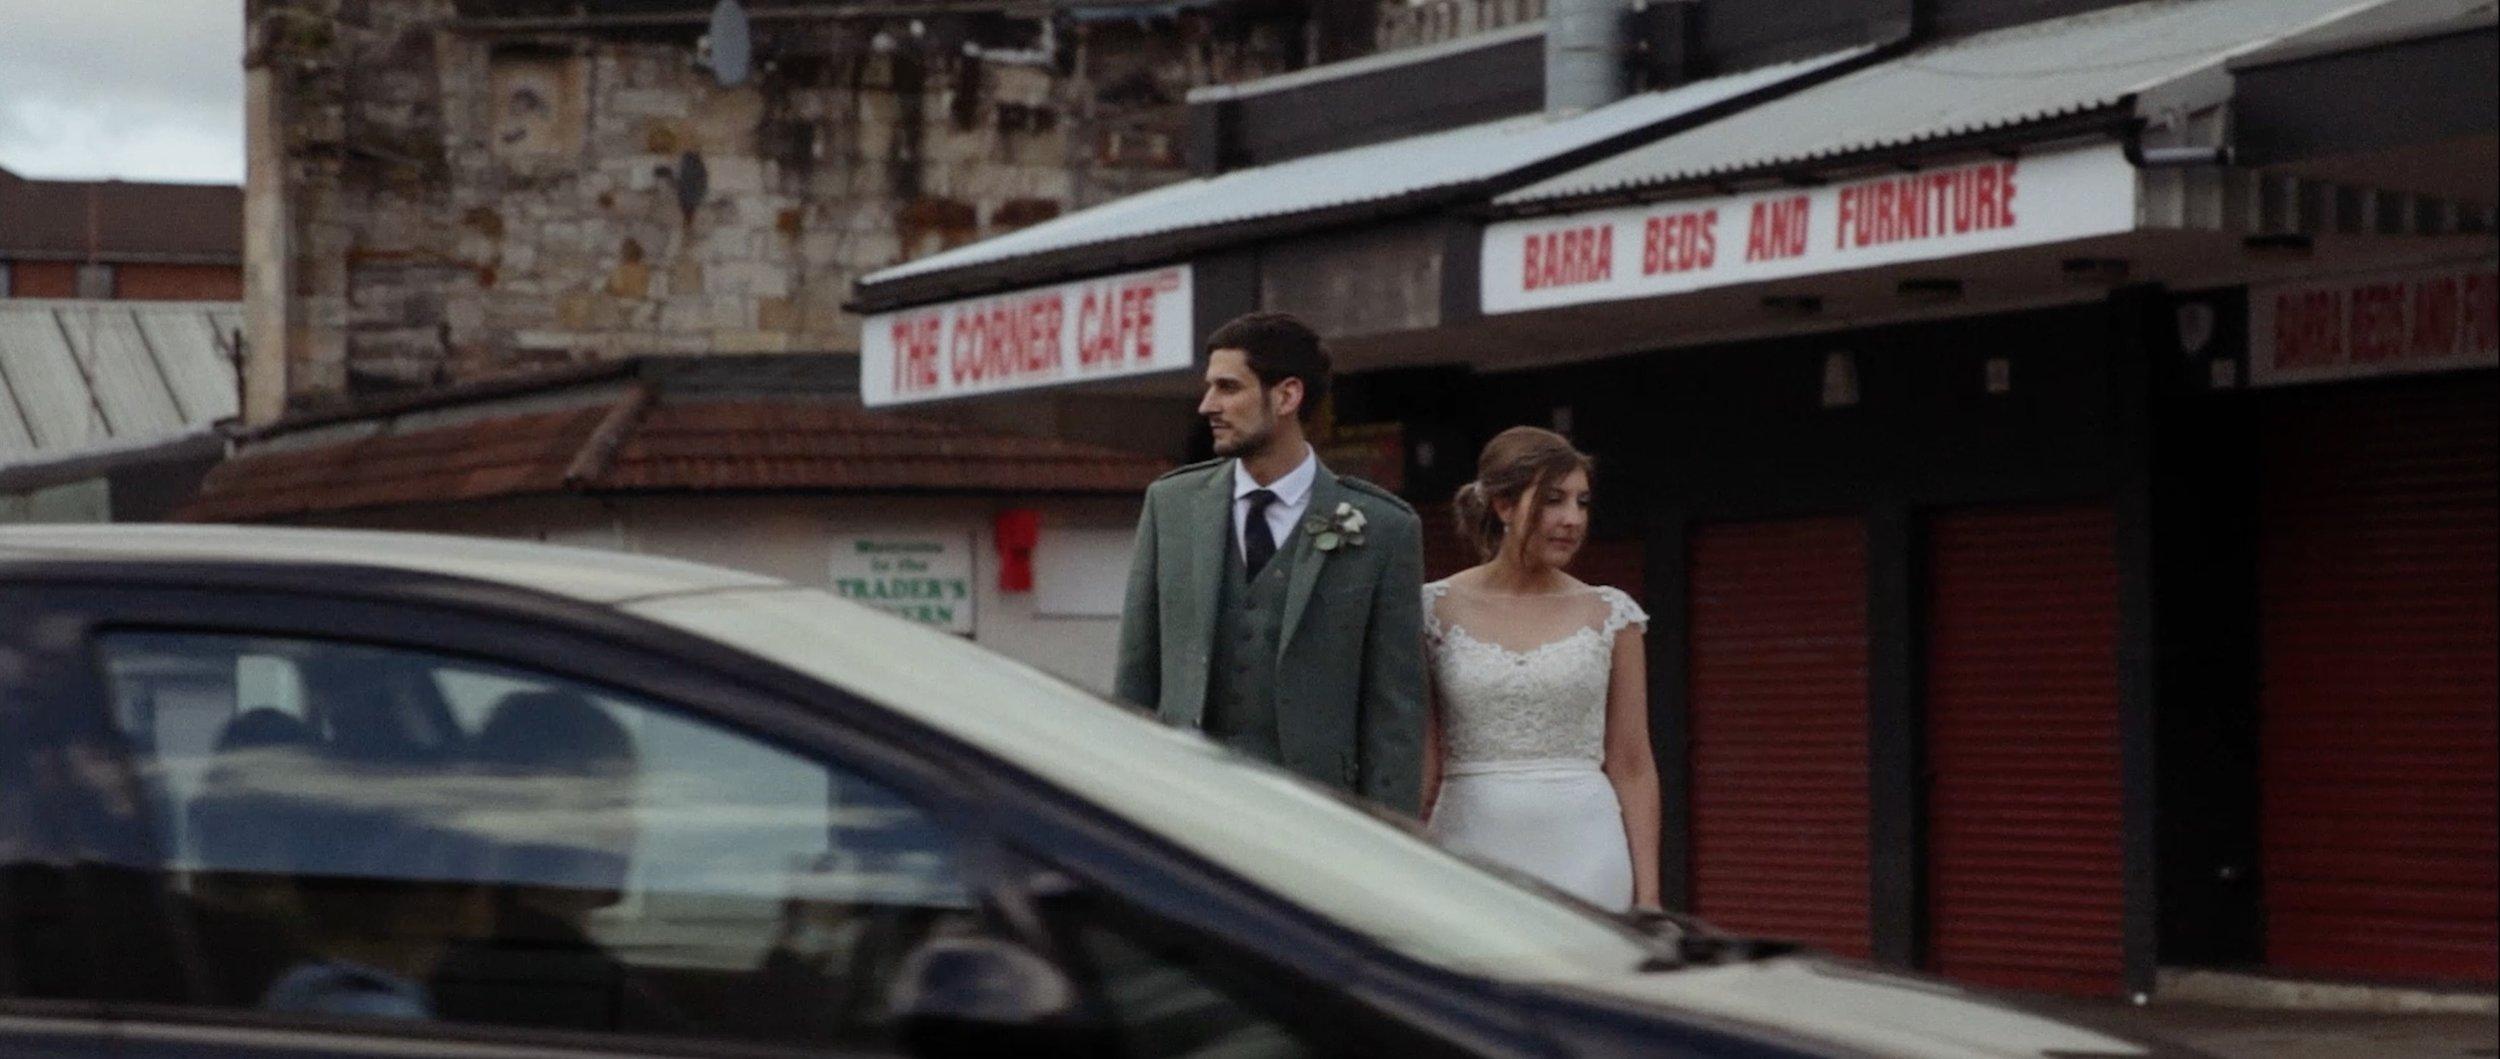 ardanaiseig-wedding-videographer_LL_05.jpg